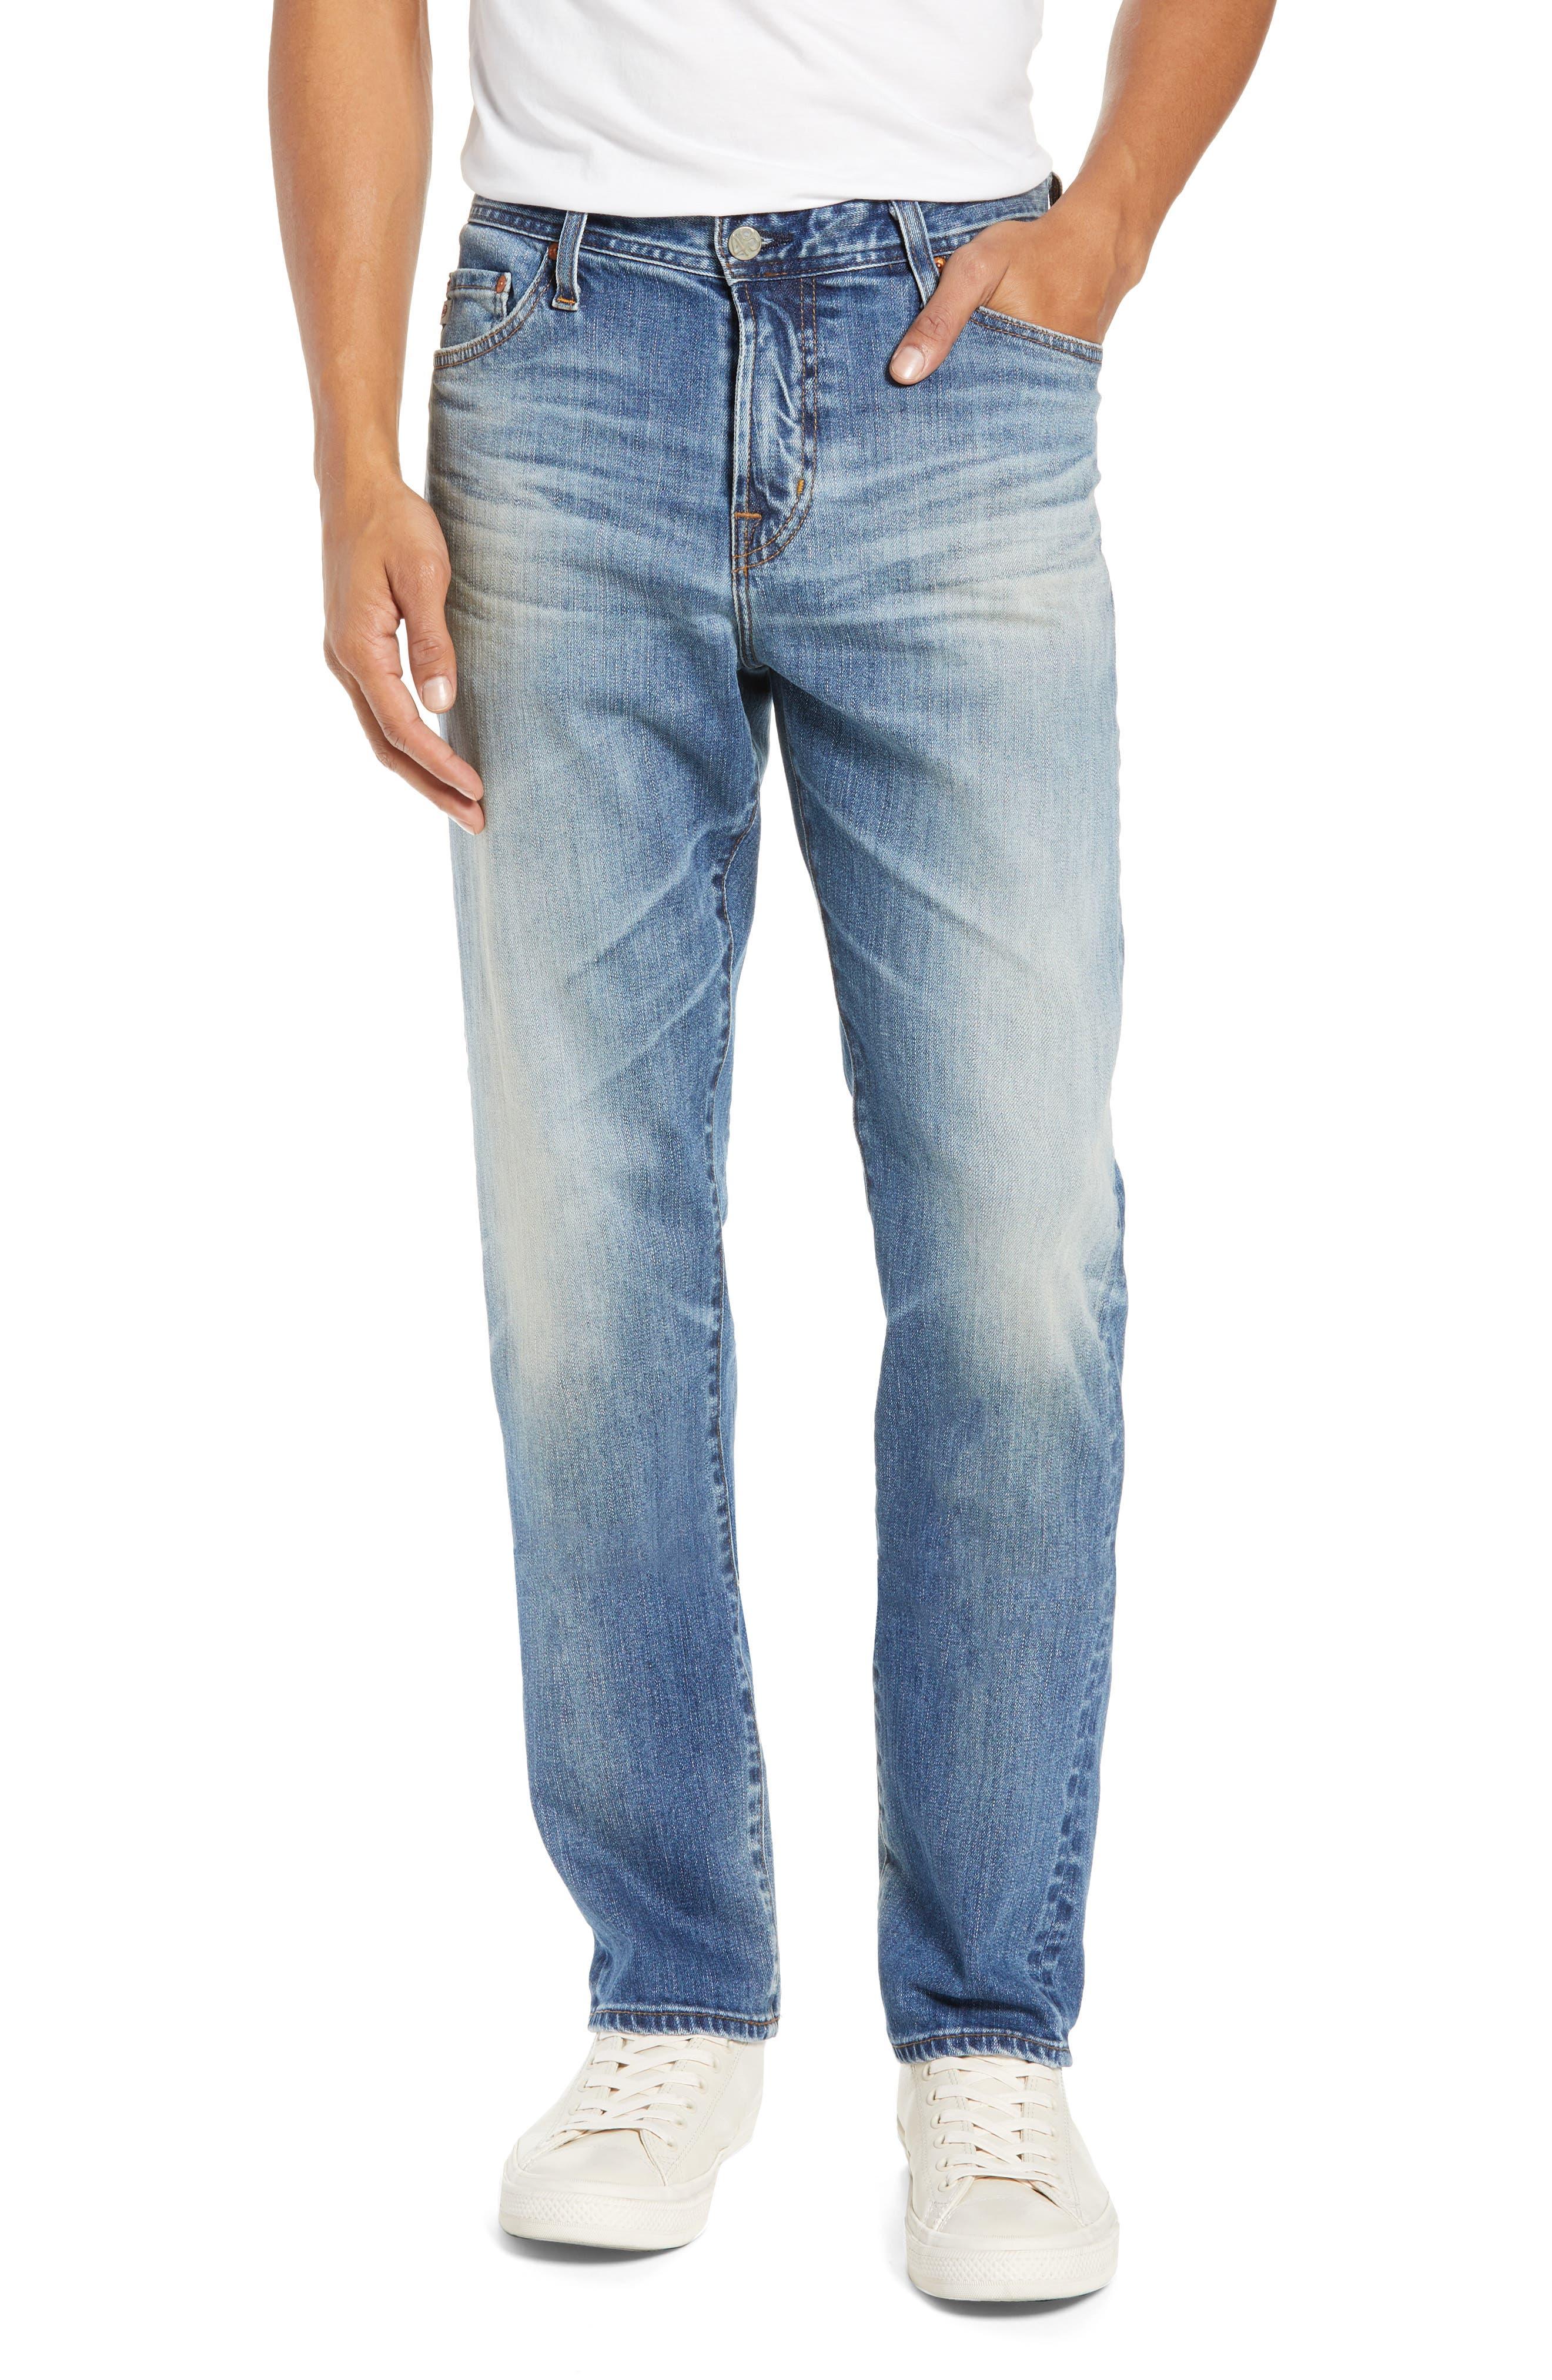 AG, Everett Slim Straight Leg Jeans, Main thumbnail 1, color, 21 YEARS SEIZE